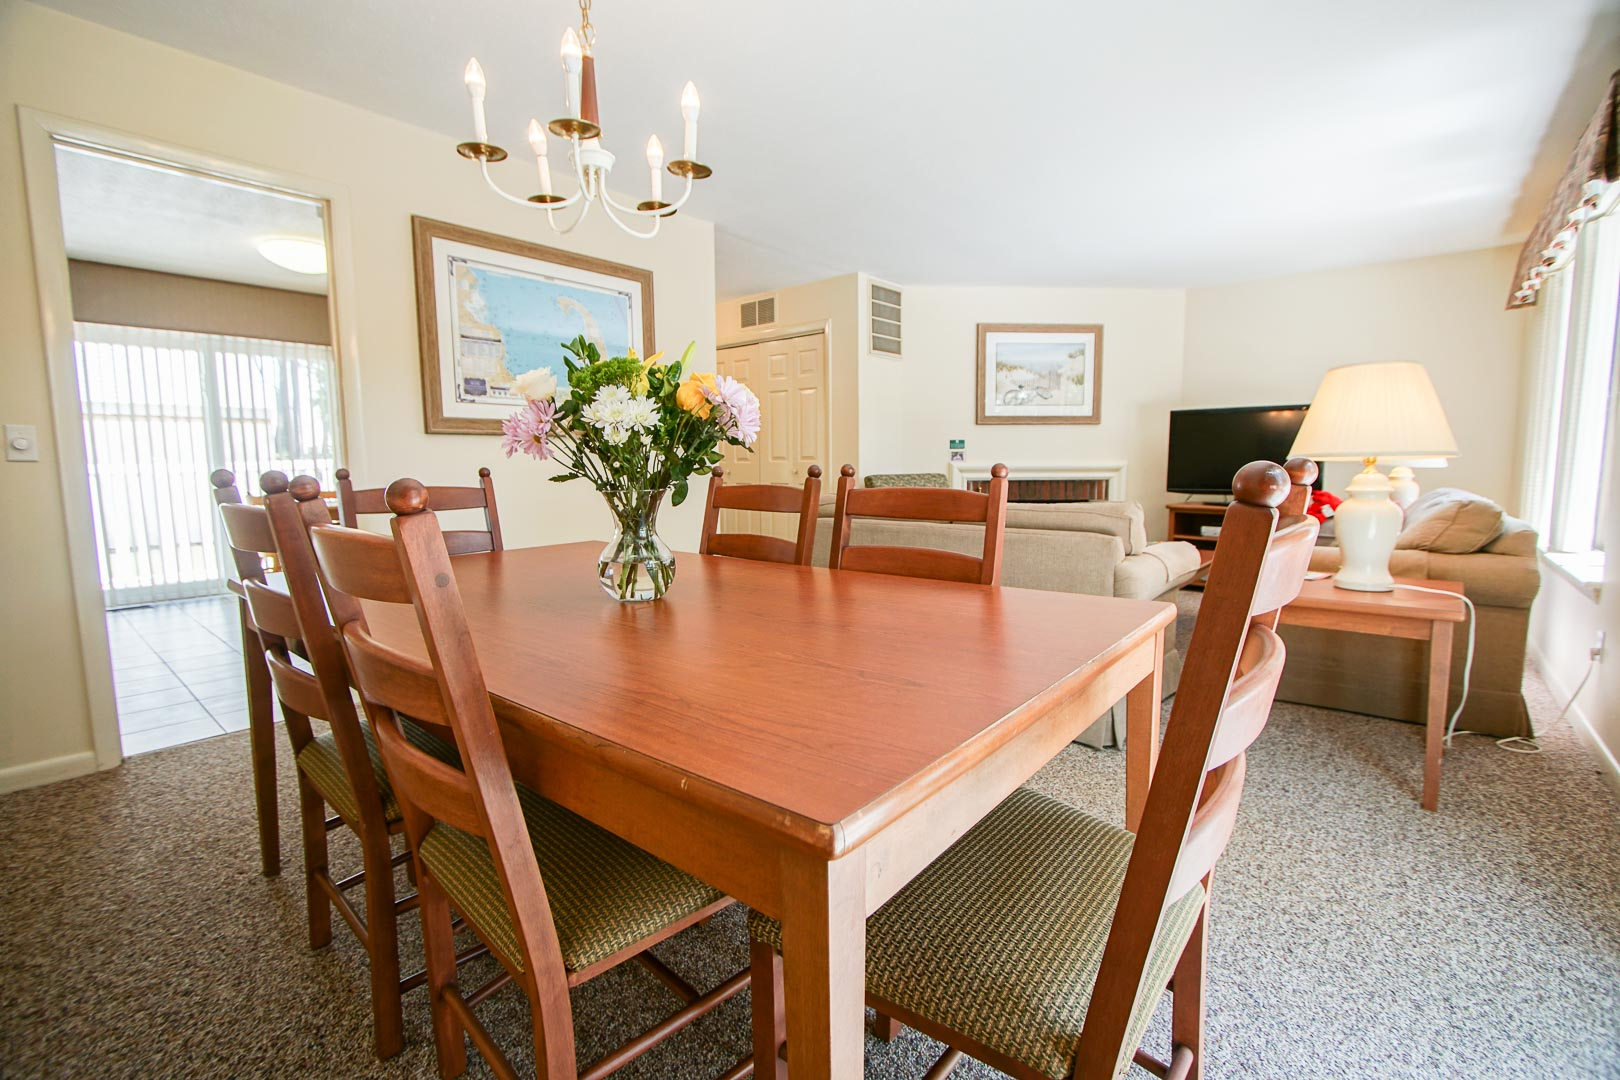 An expansive living room area at VRI's Brewster Green Resort in Massachusetts.